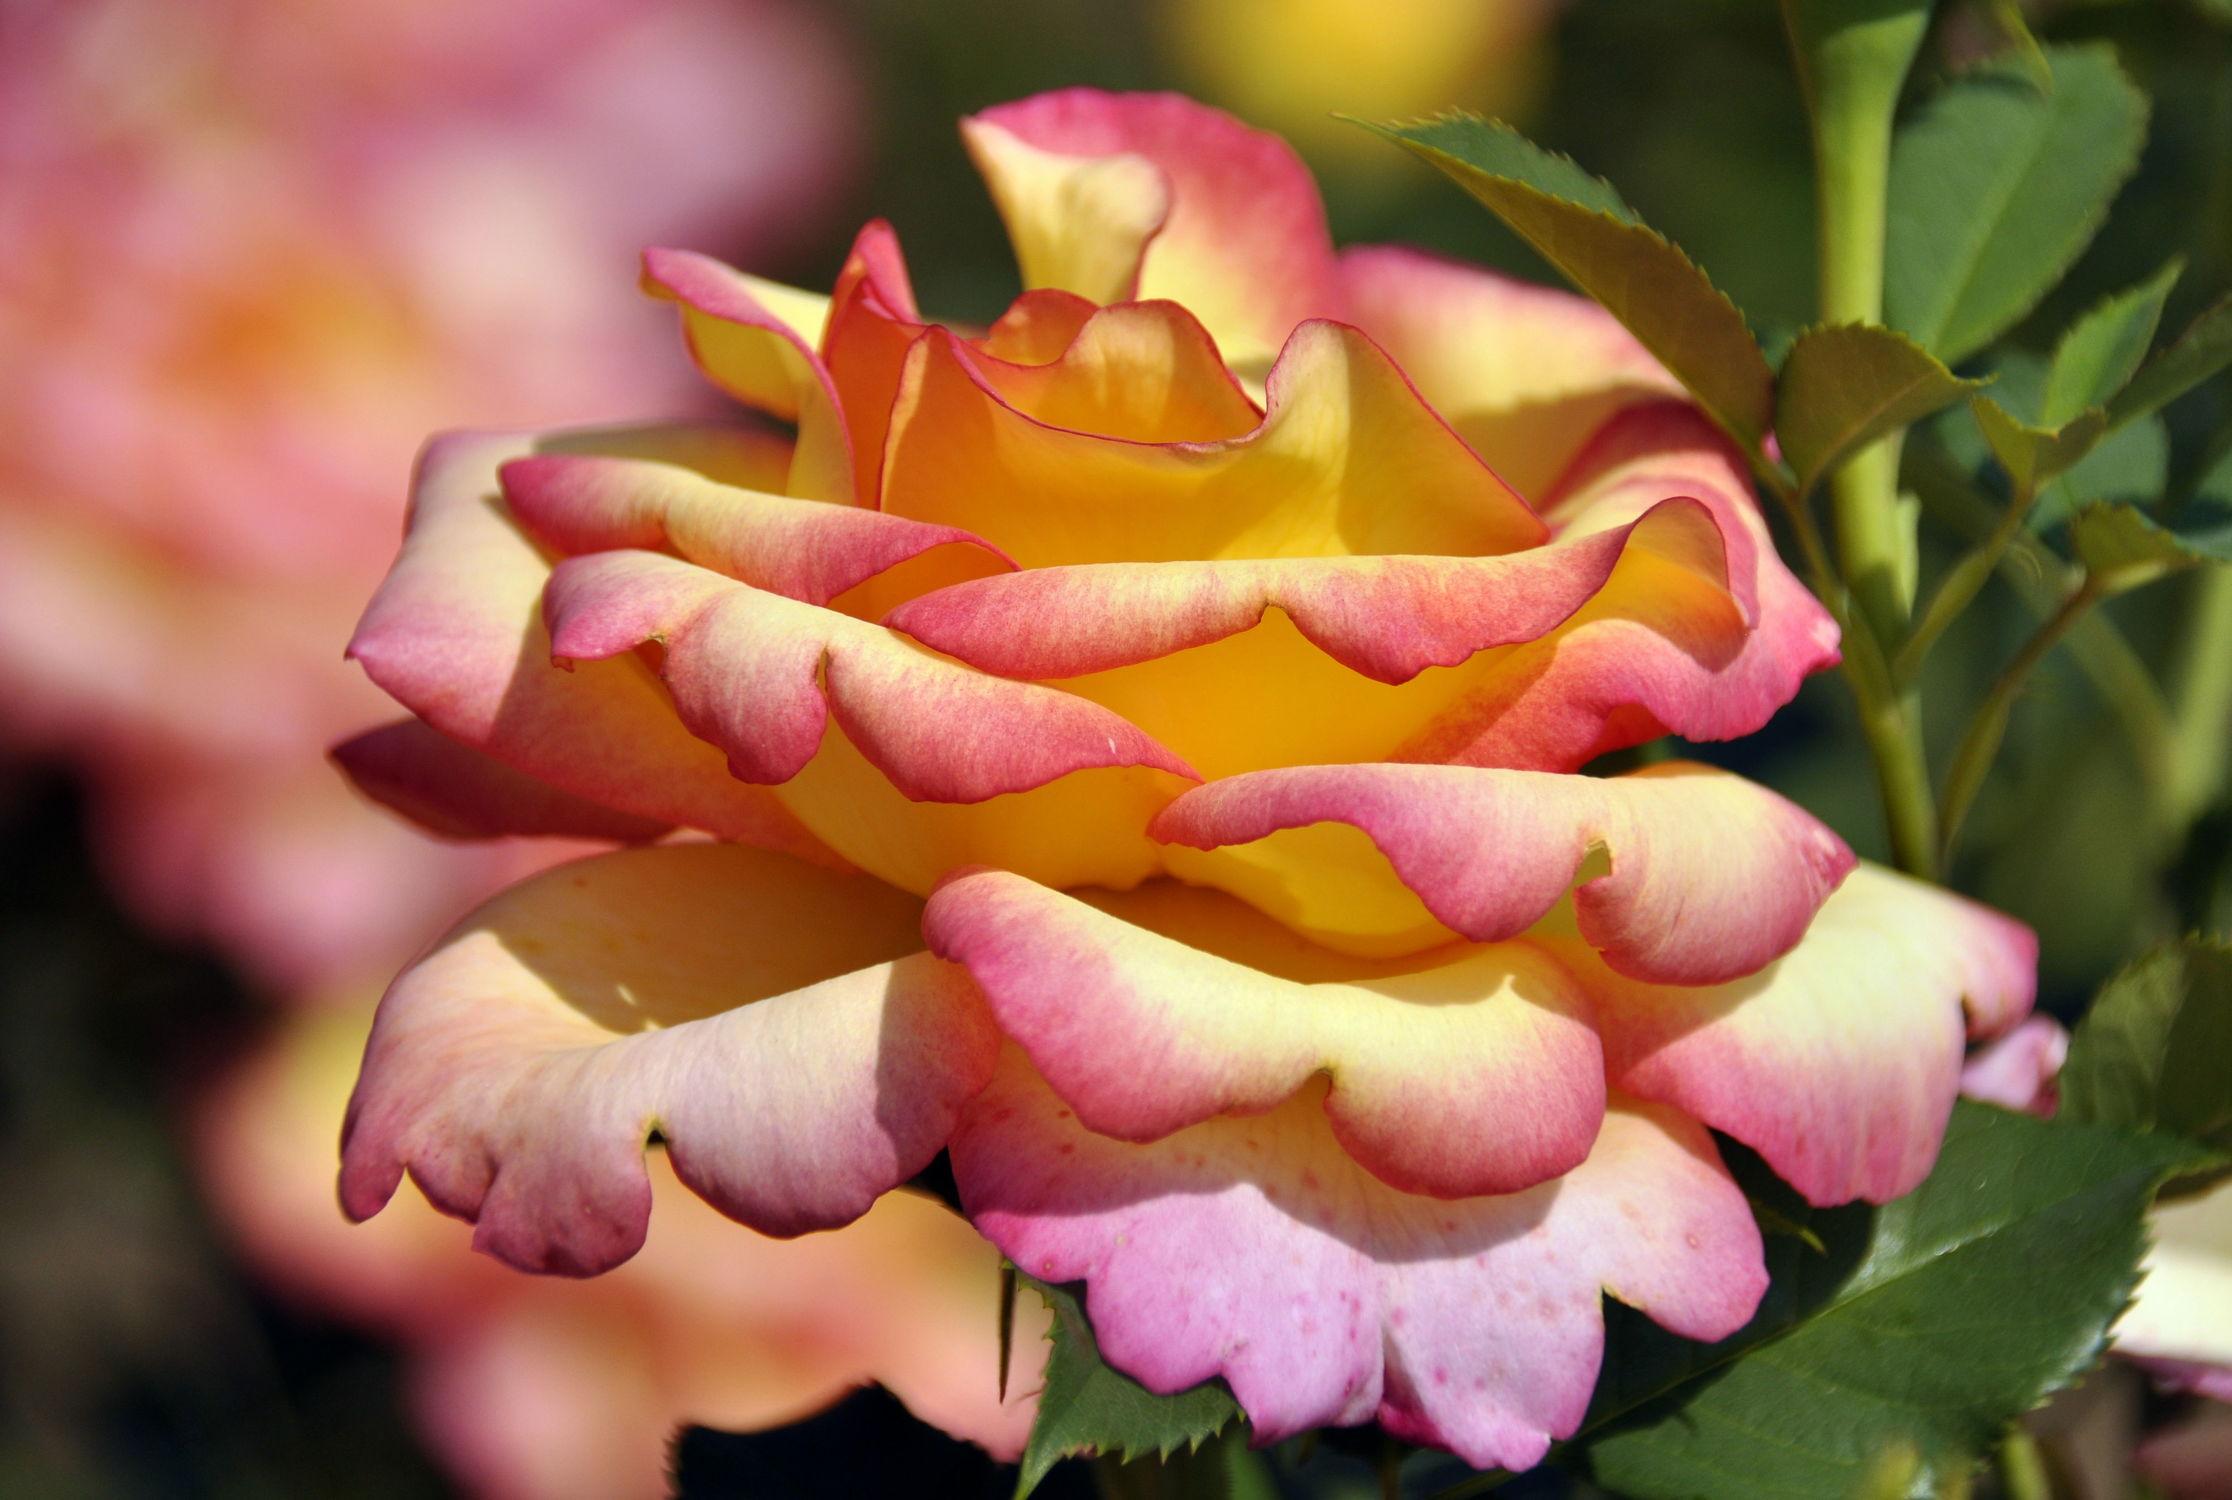 Bild mit Rosen, Rose, Roses, Schönheit, blüte, beetrose, edelrose, edel